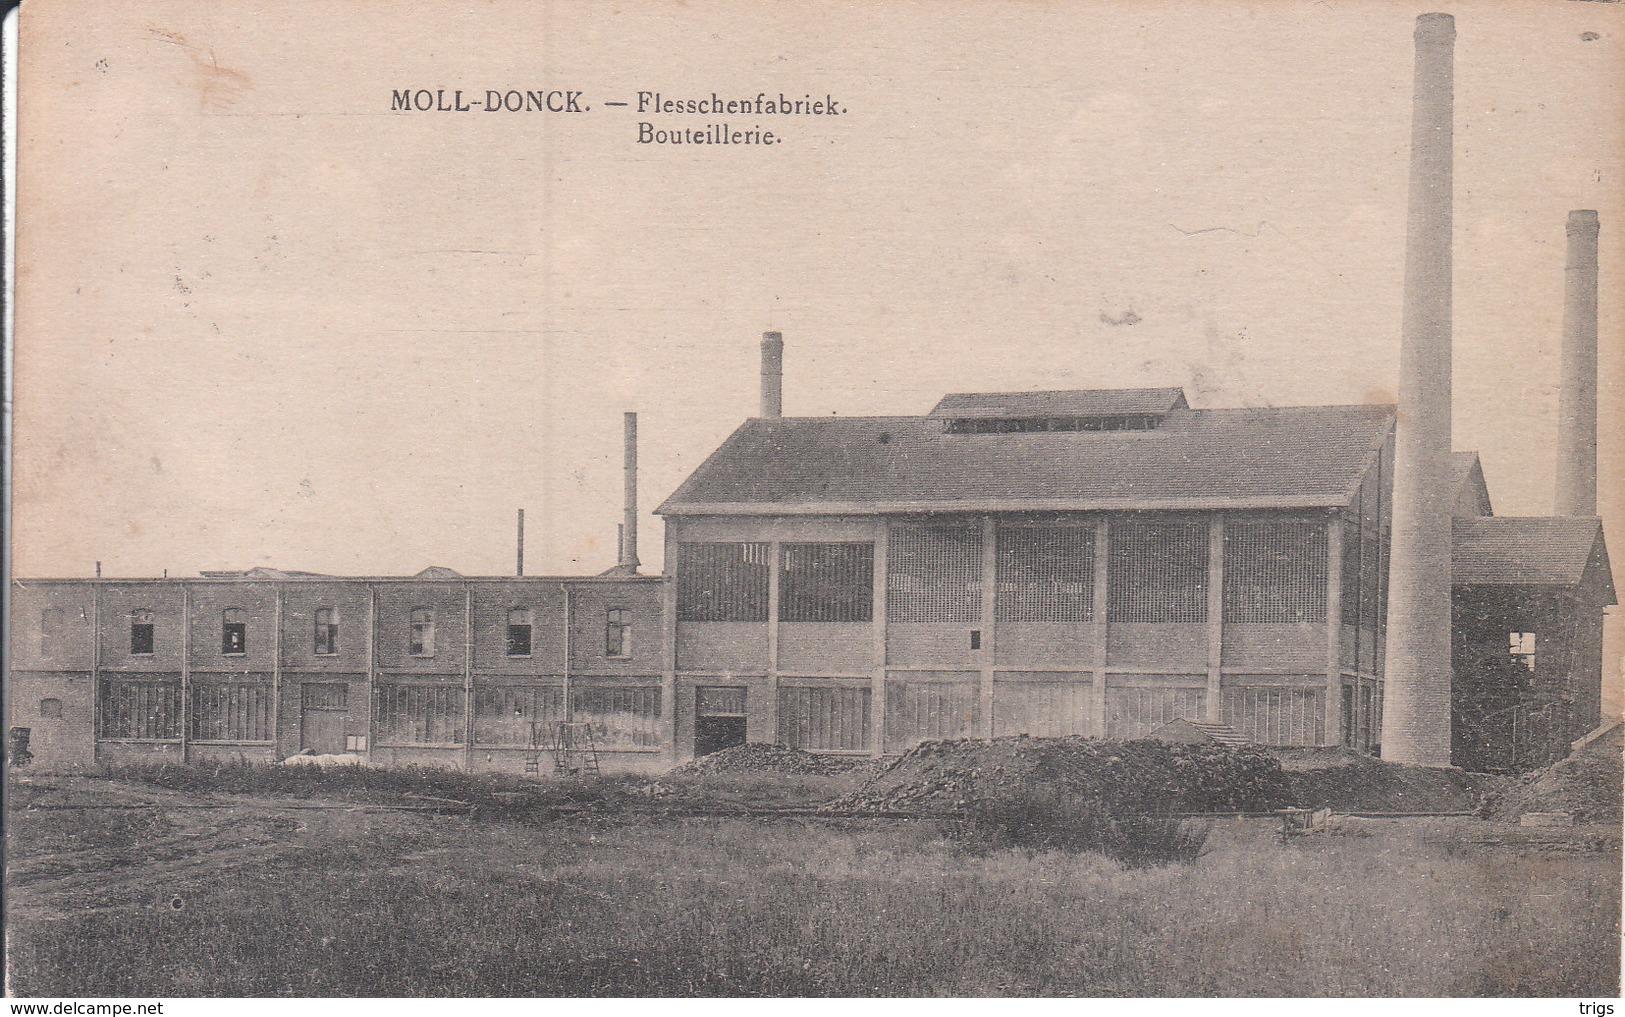 Donck - Flesschenfabriek - Mol